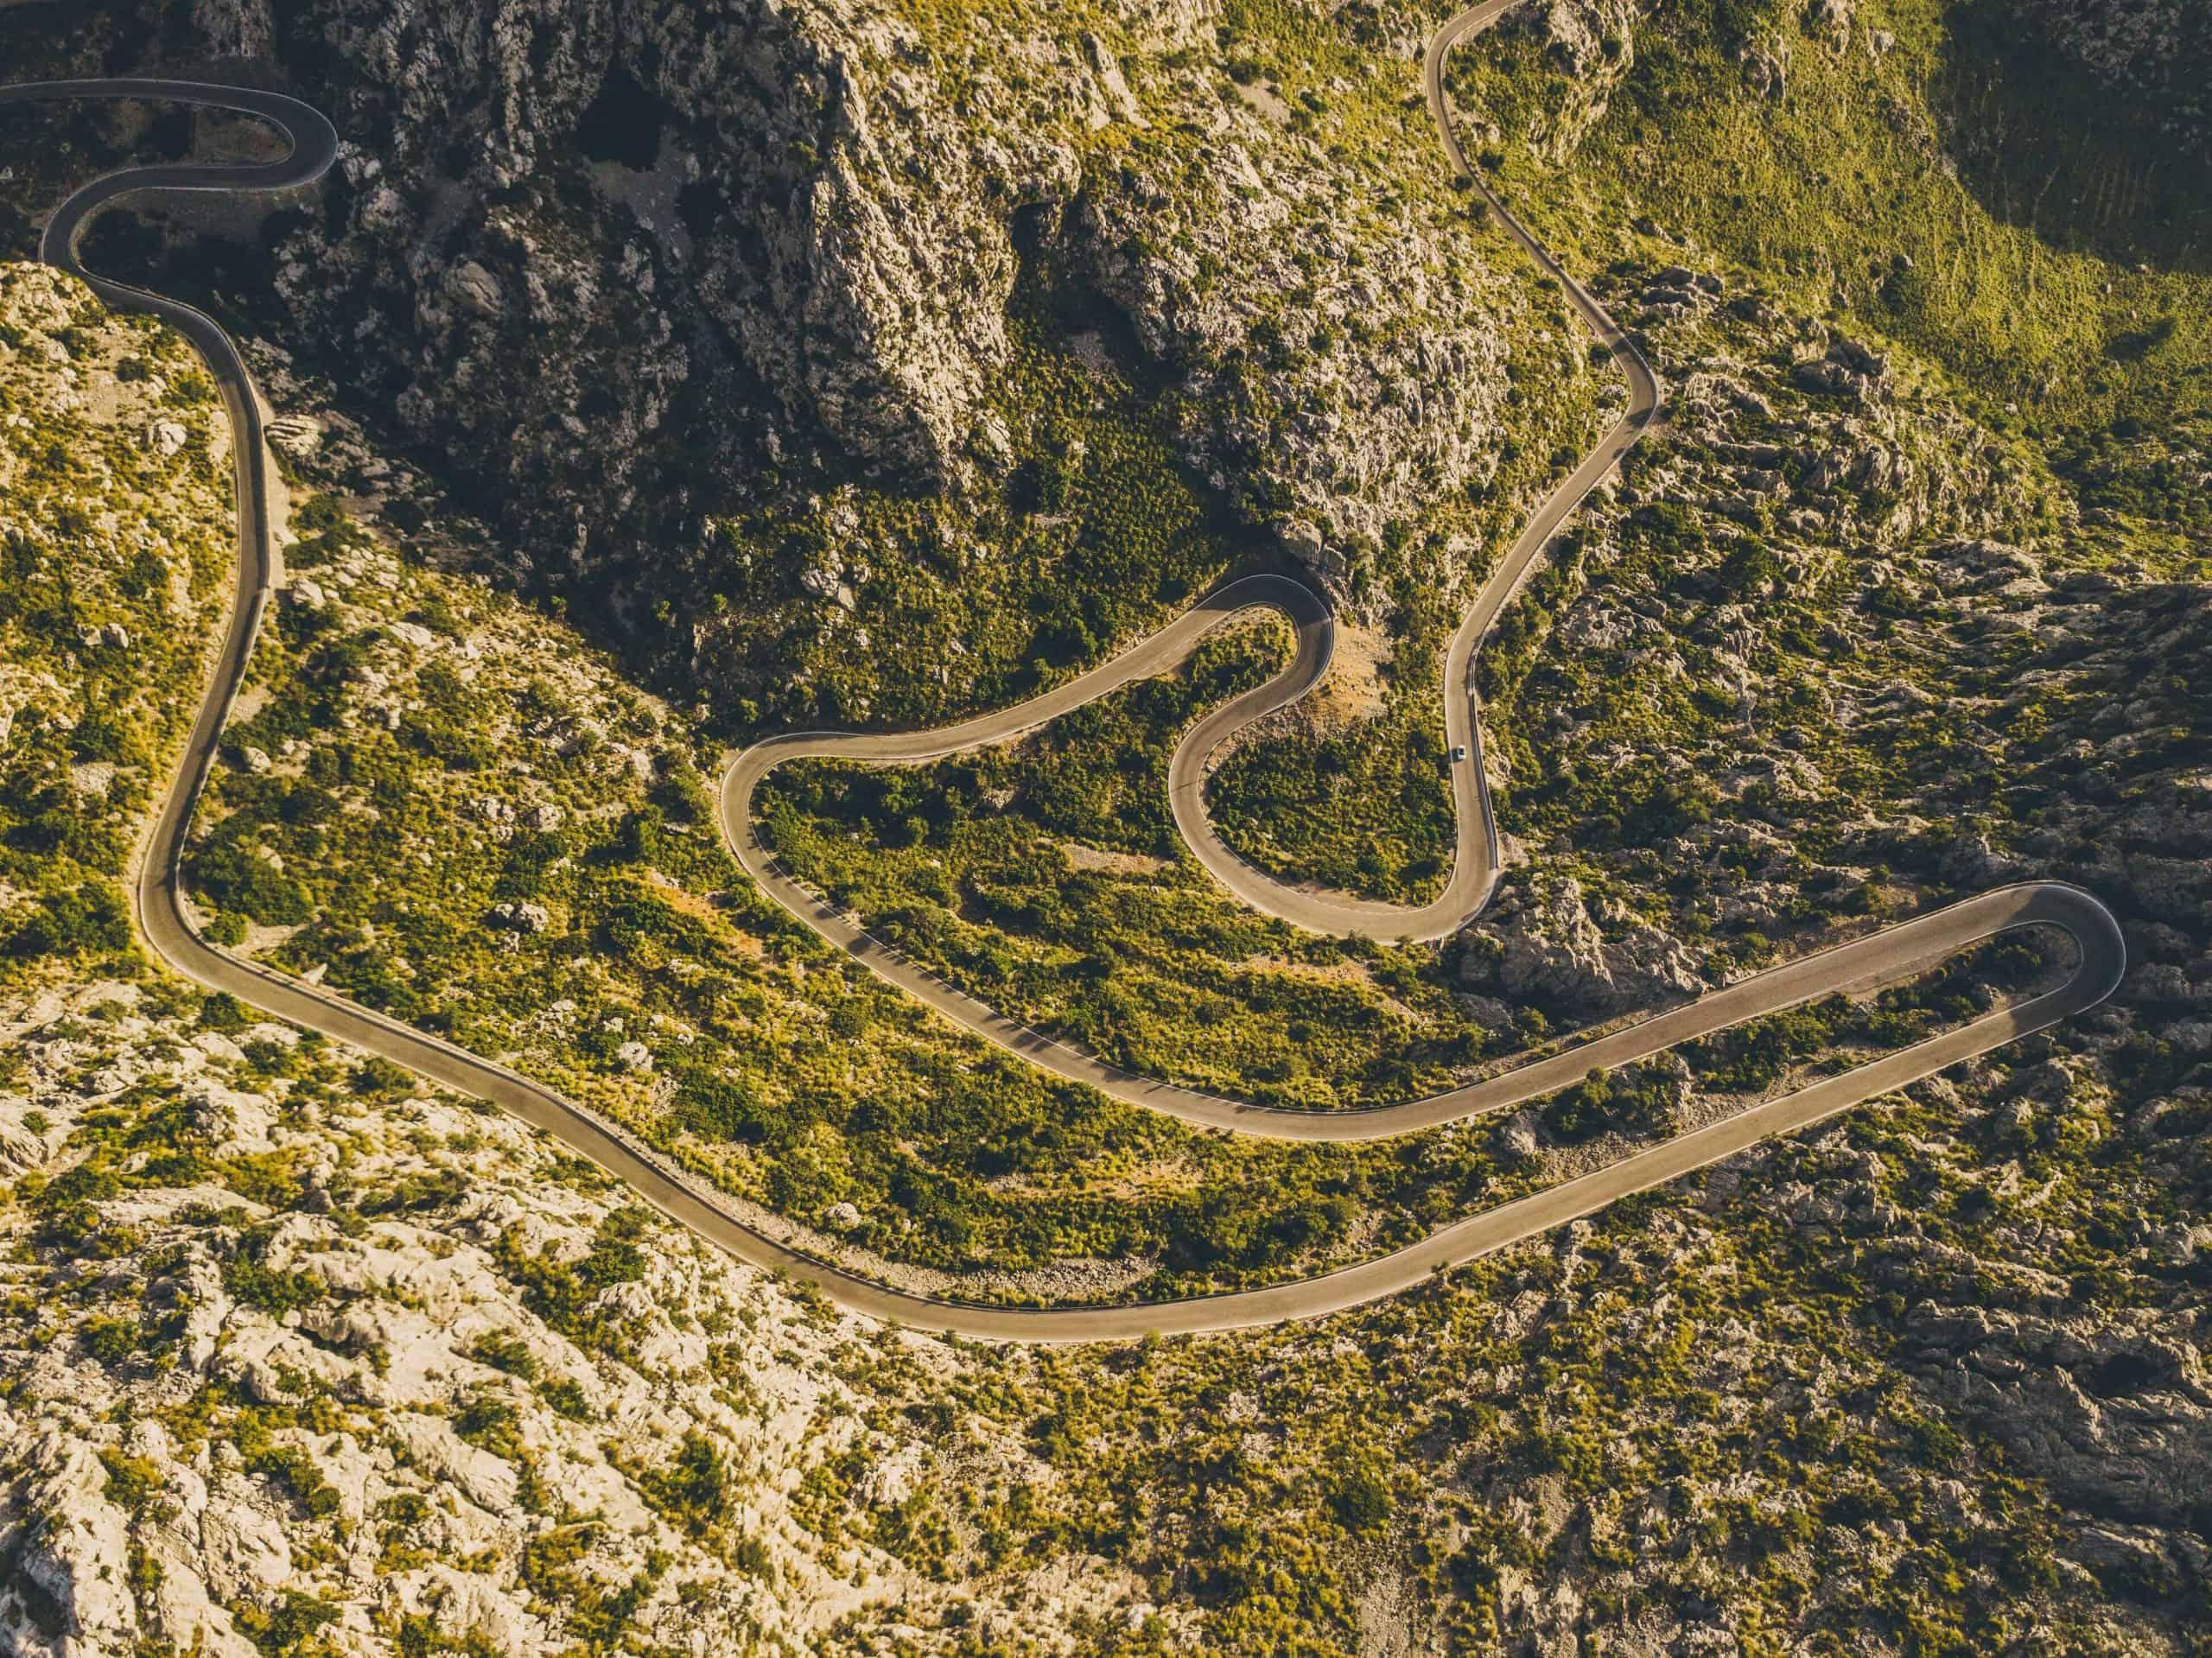 Aerial view of Sa Calobra switchback roads in Mallorca